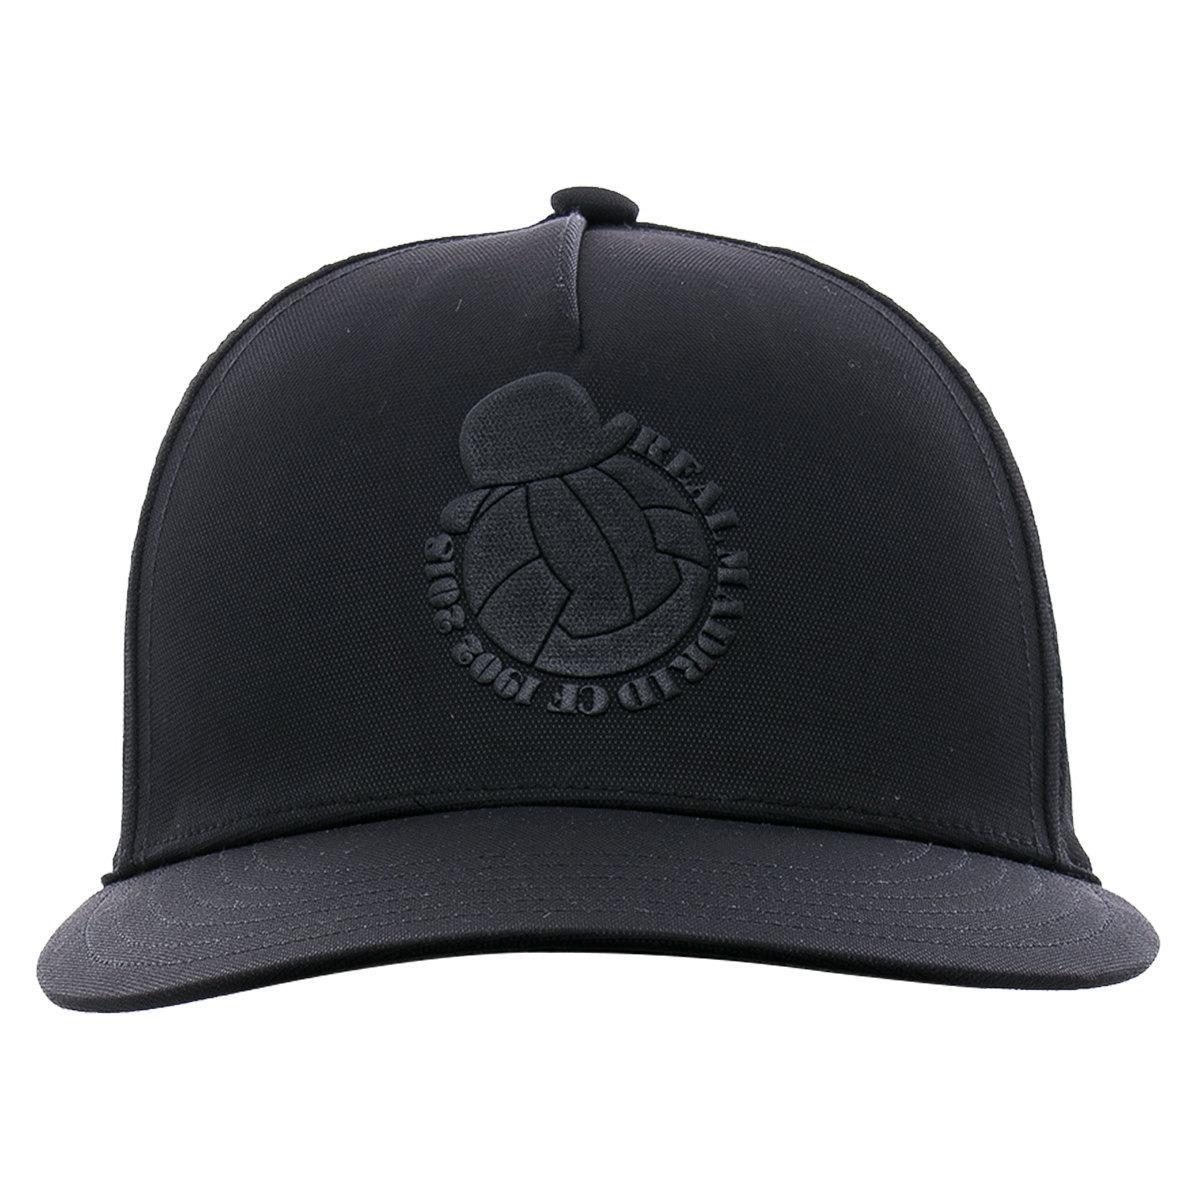 gorra real madrid negro adidas sport 78 tienda oficial. Cargando zoom. b003be9375a